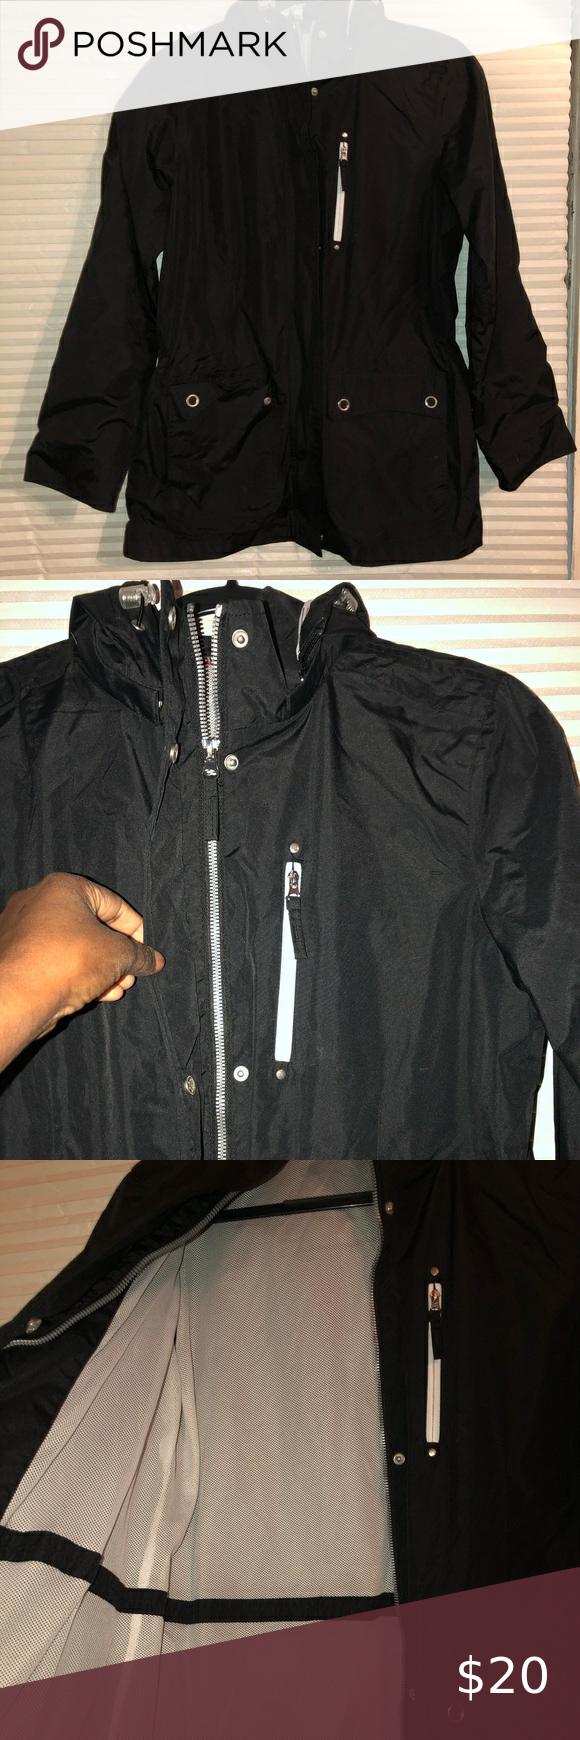 Izod Black Jacket Perfect Condition Izod Jackets Coats Utility Jackets Black Jacket Clothes Design Jackets For Women [ 1740 x 580 Pixel ]